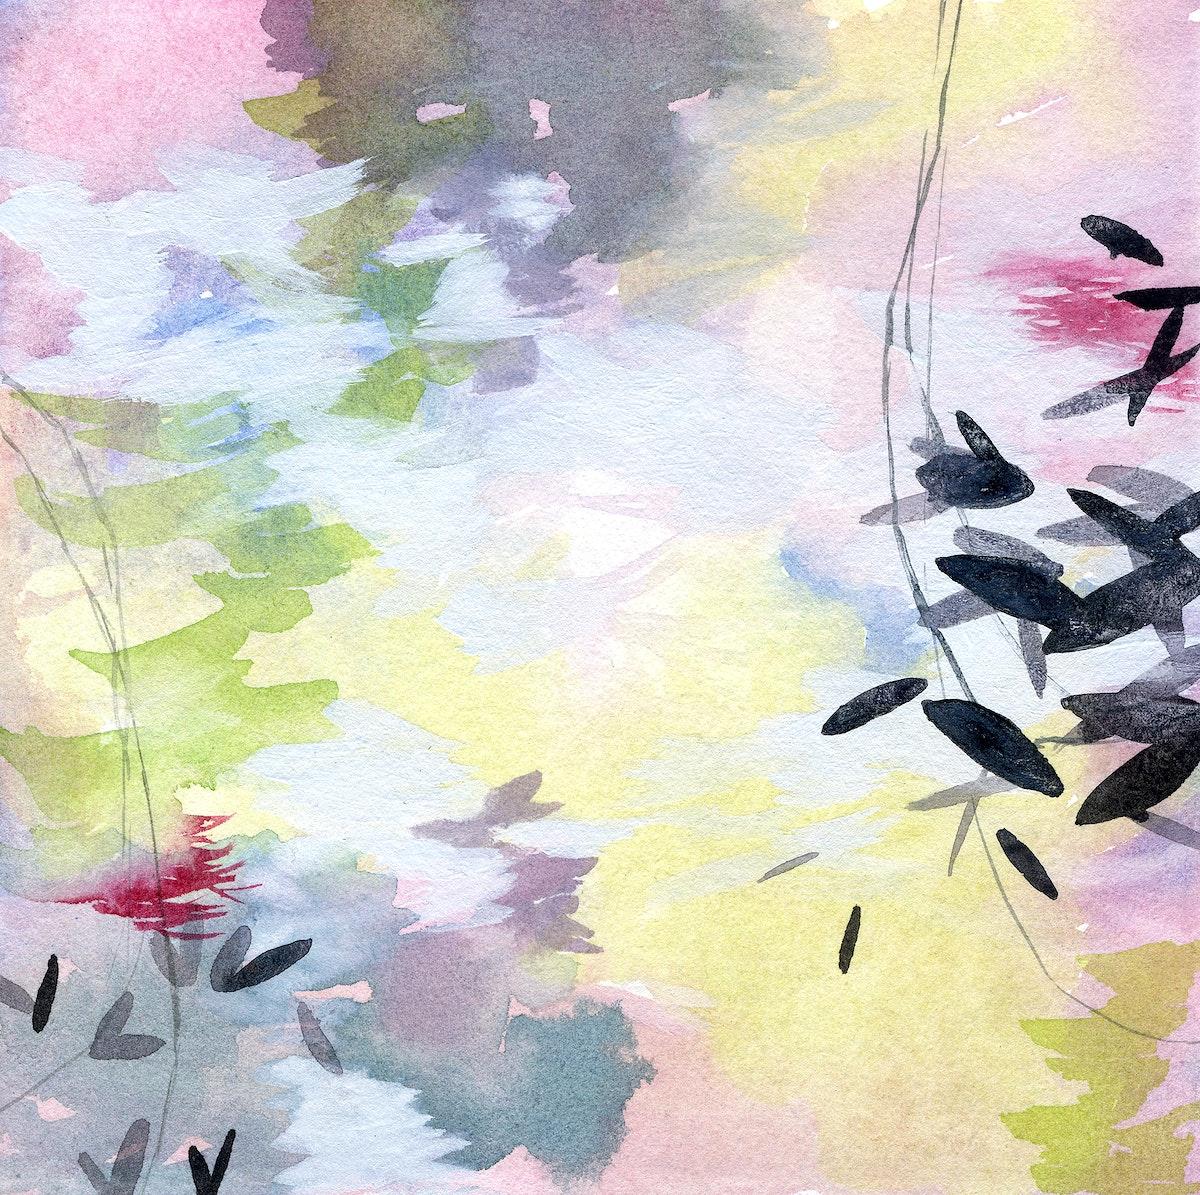 Botanical abstract fine art print